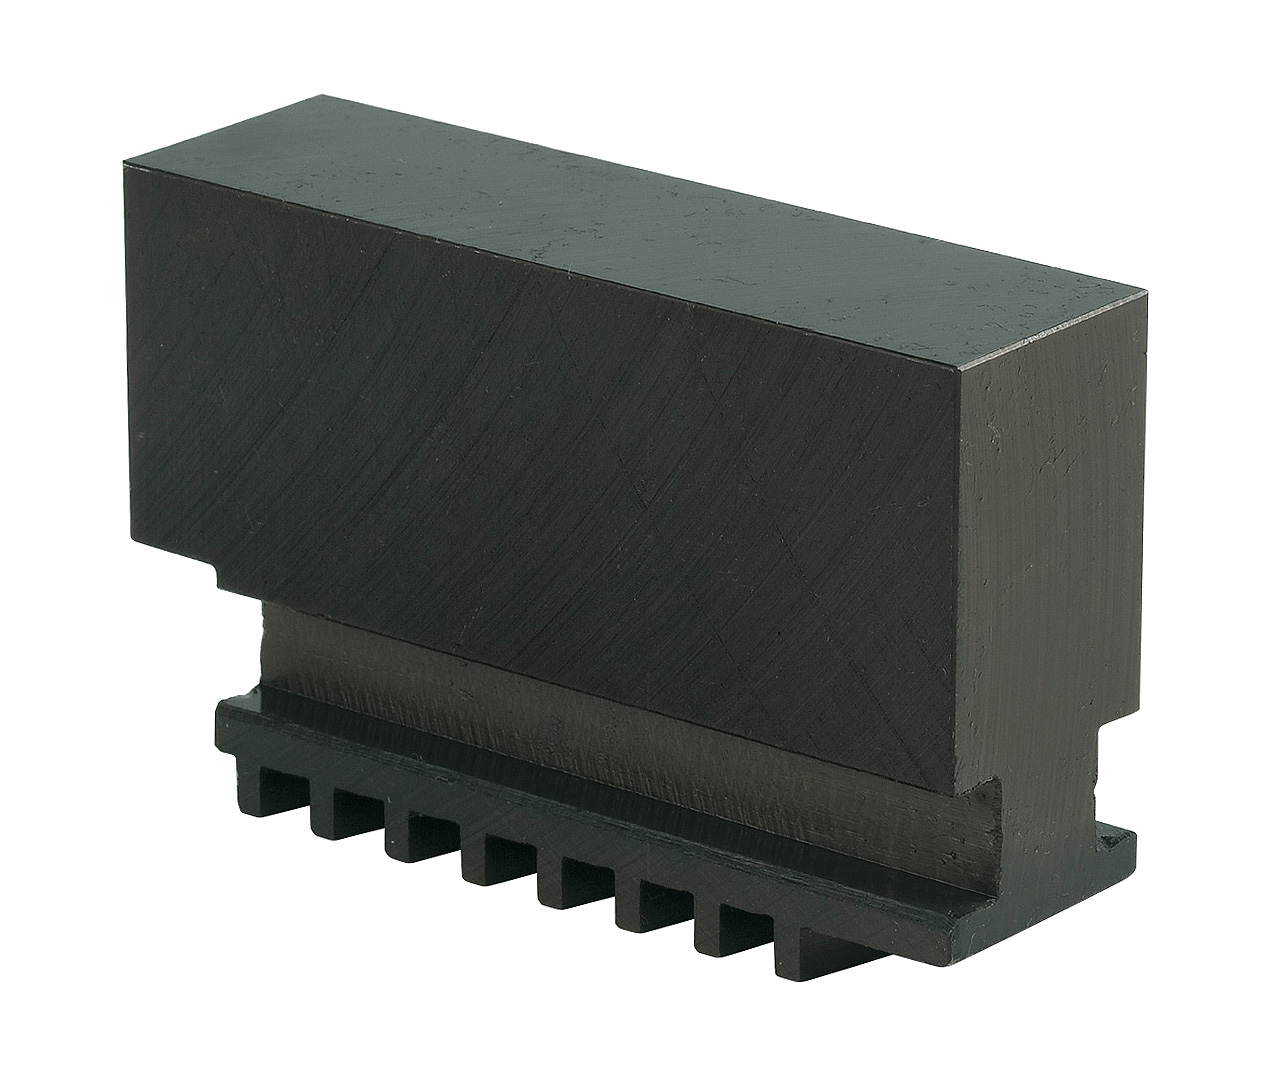 Szczęki jednolite miękkie - komplet DSJ-DK11-160 BERNARDO